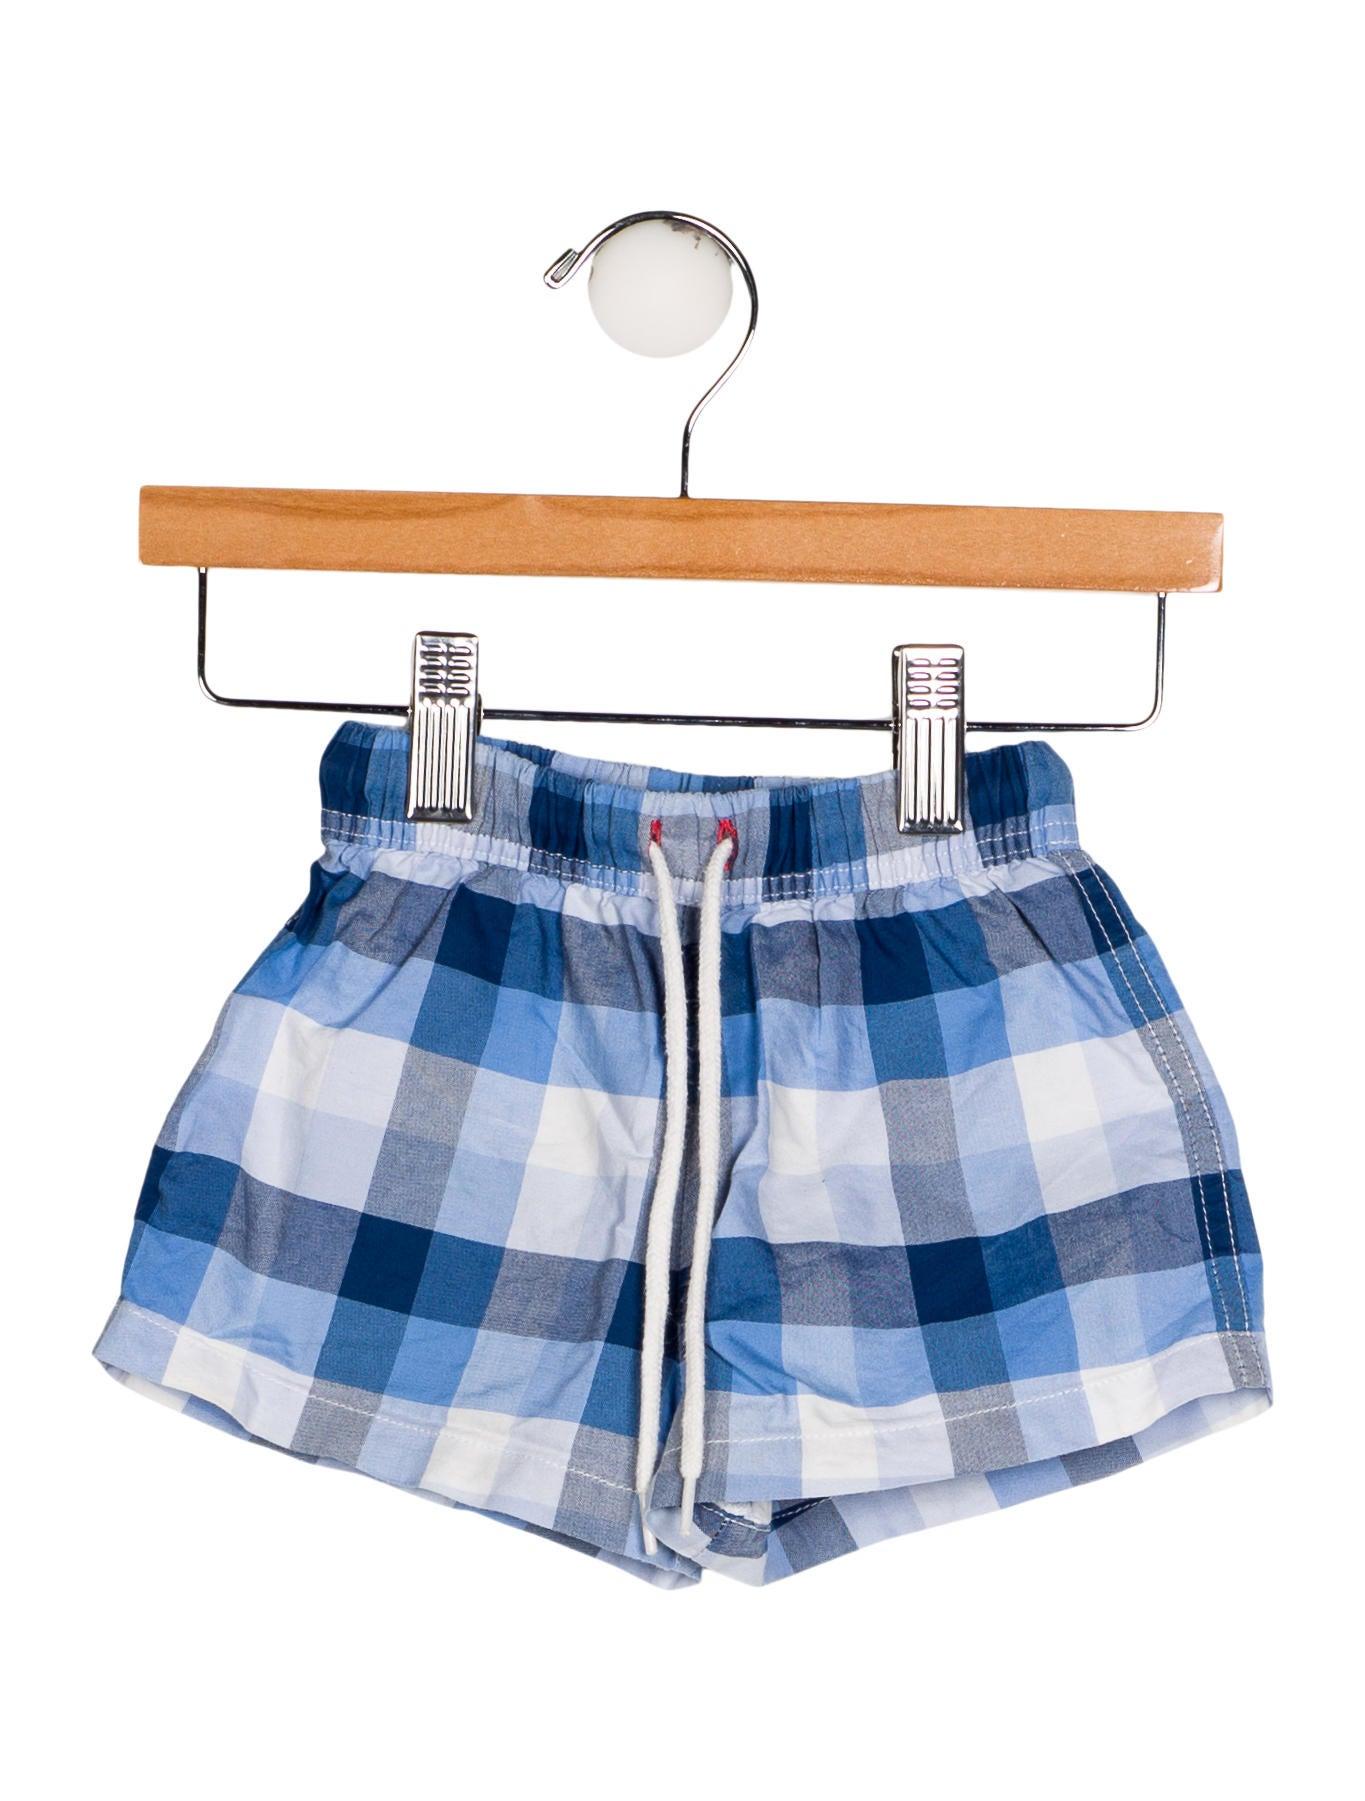 03d30f93f6ee9 Jacadi Boys' Gingham Swim Shorts - Boys - WJDCI22813 | The RealReal